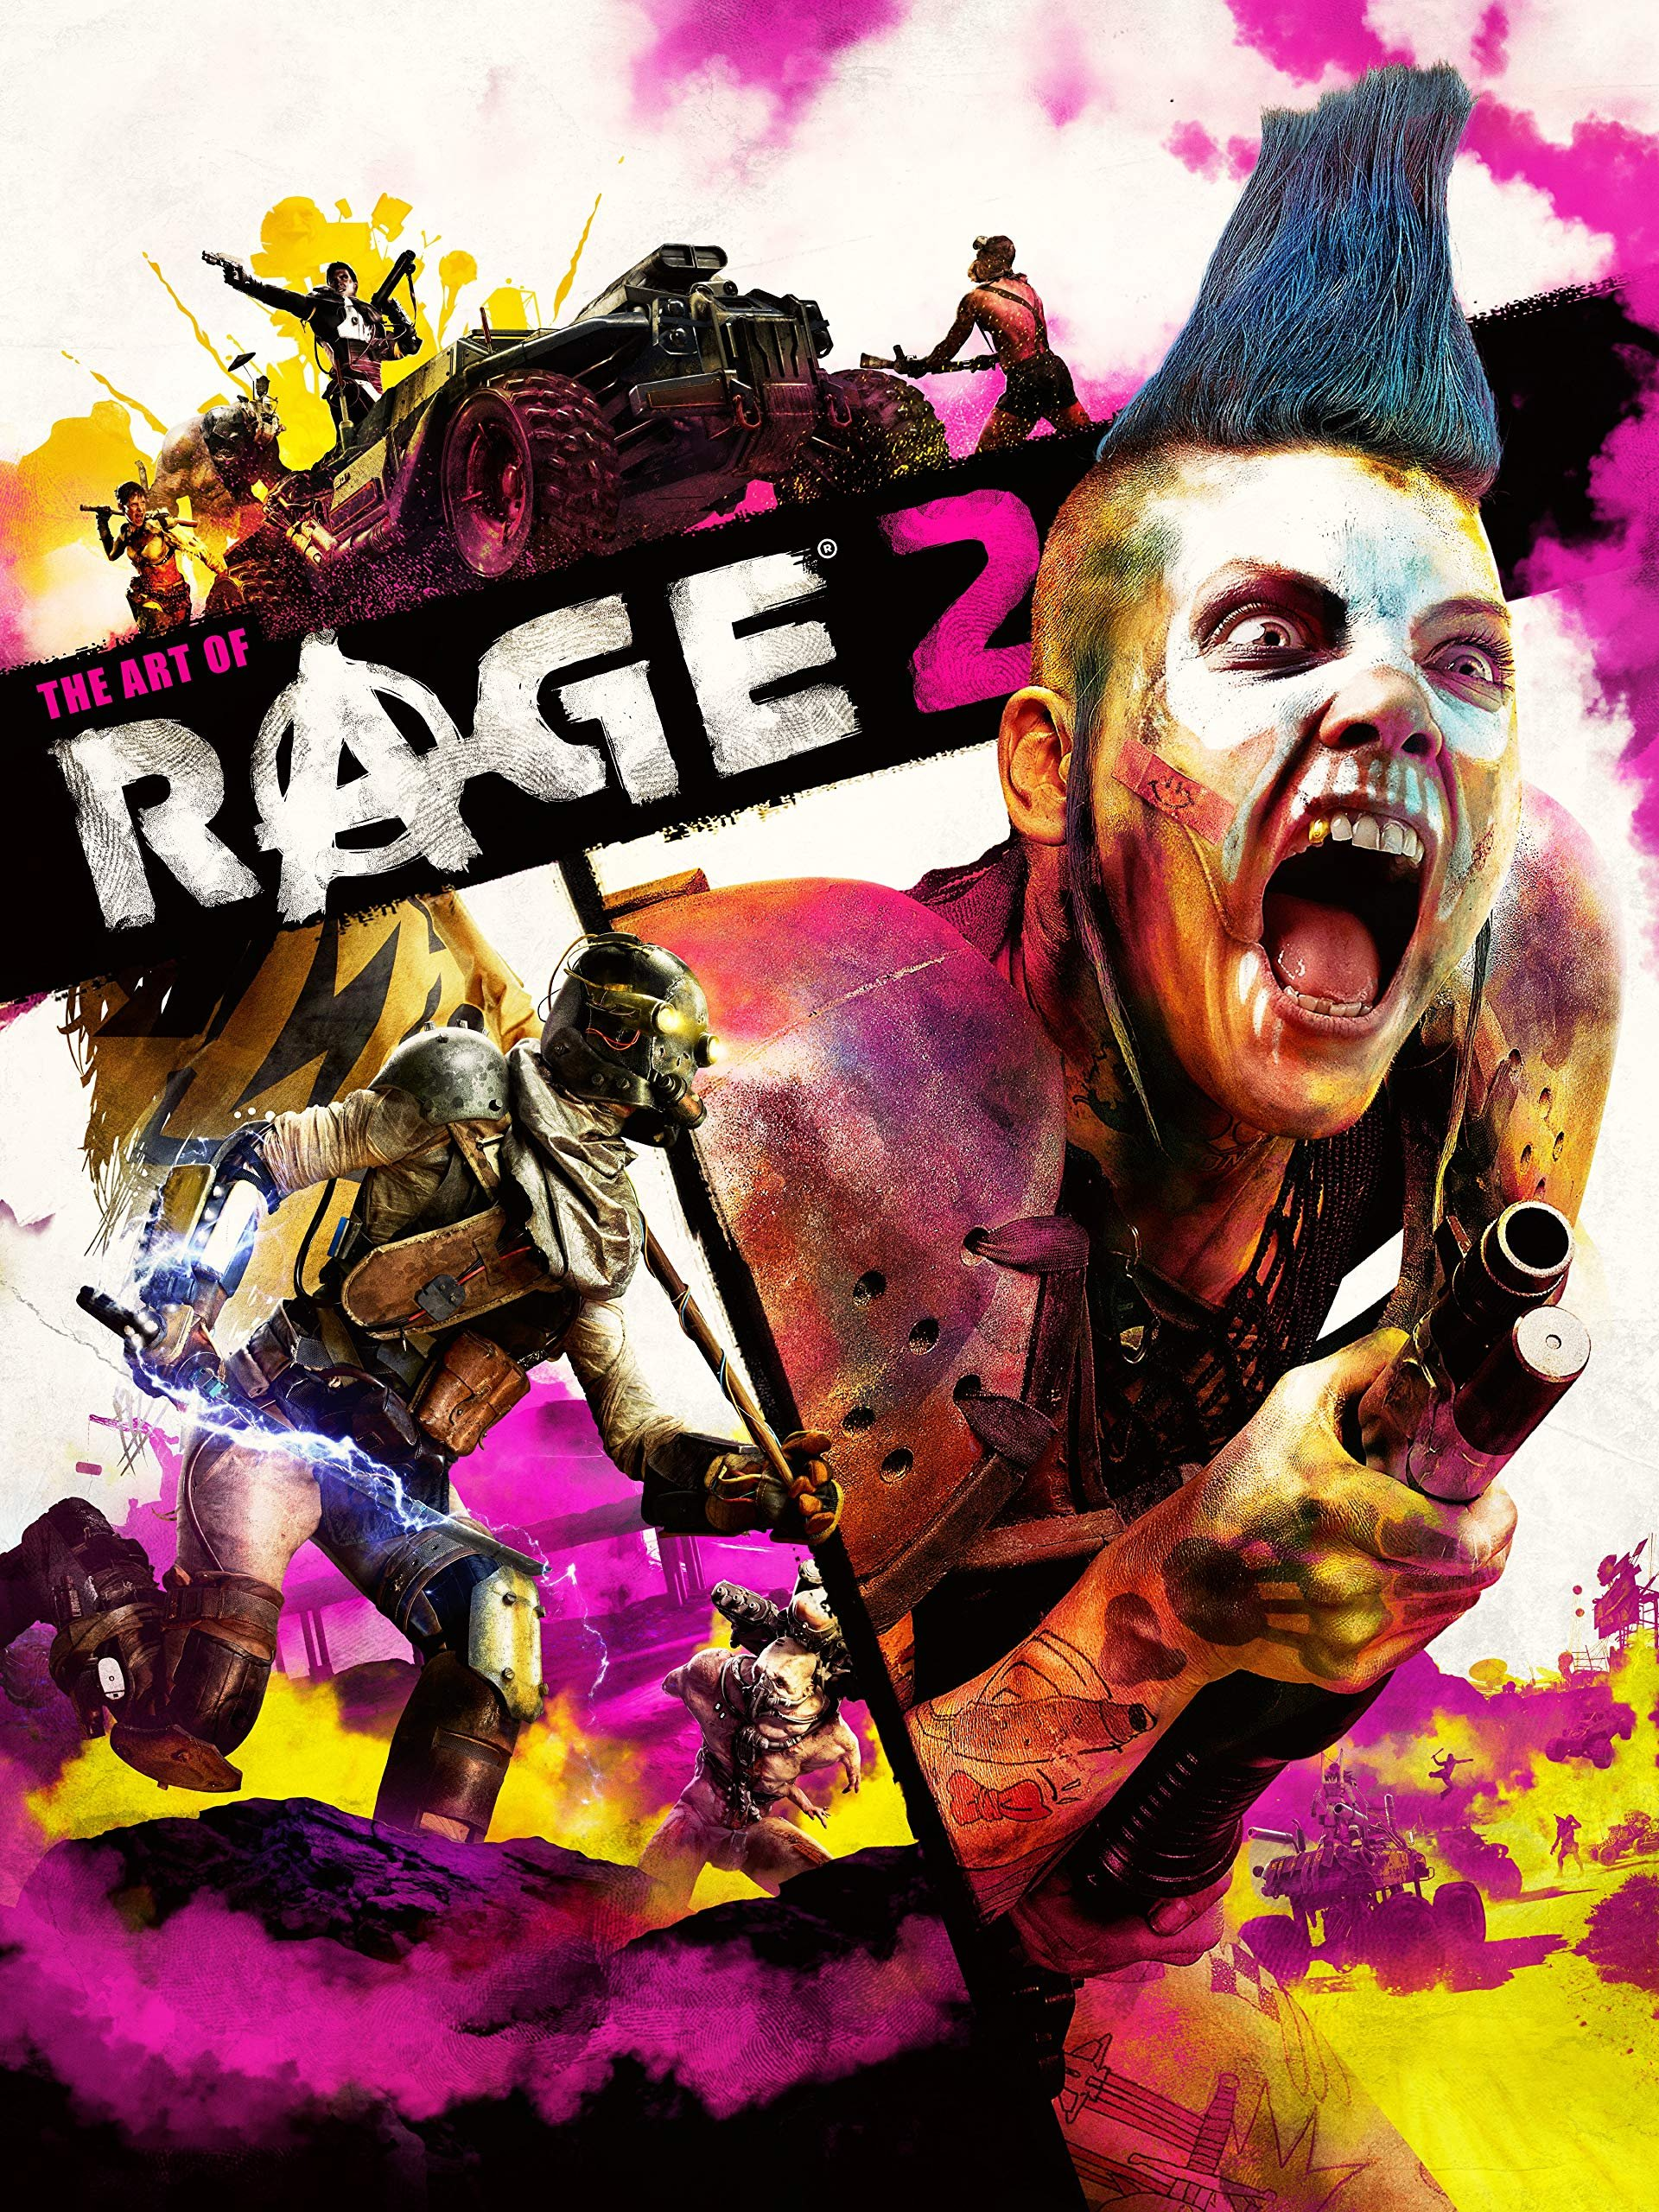 Rage - The Art of Rage 2